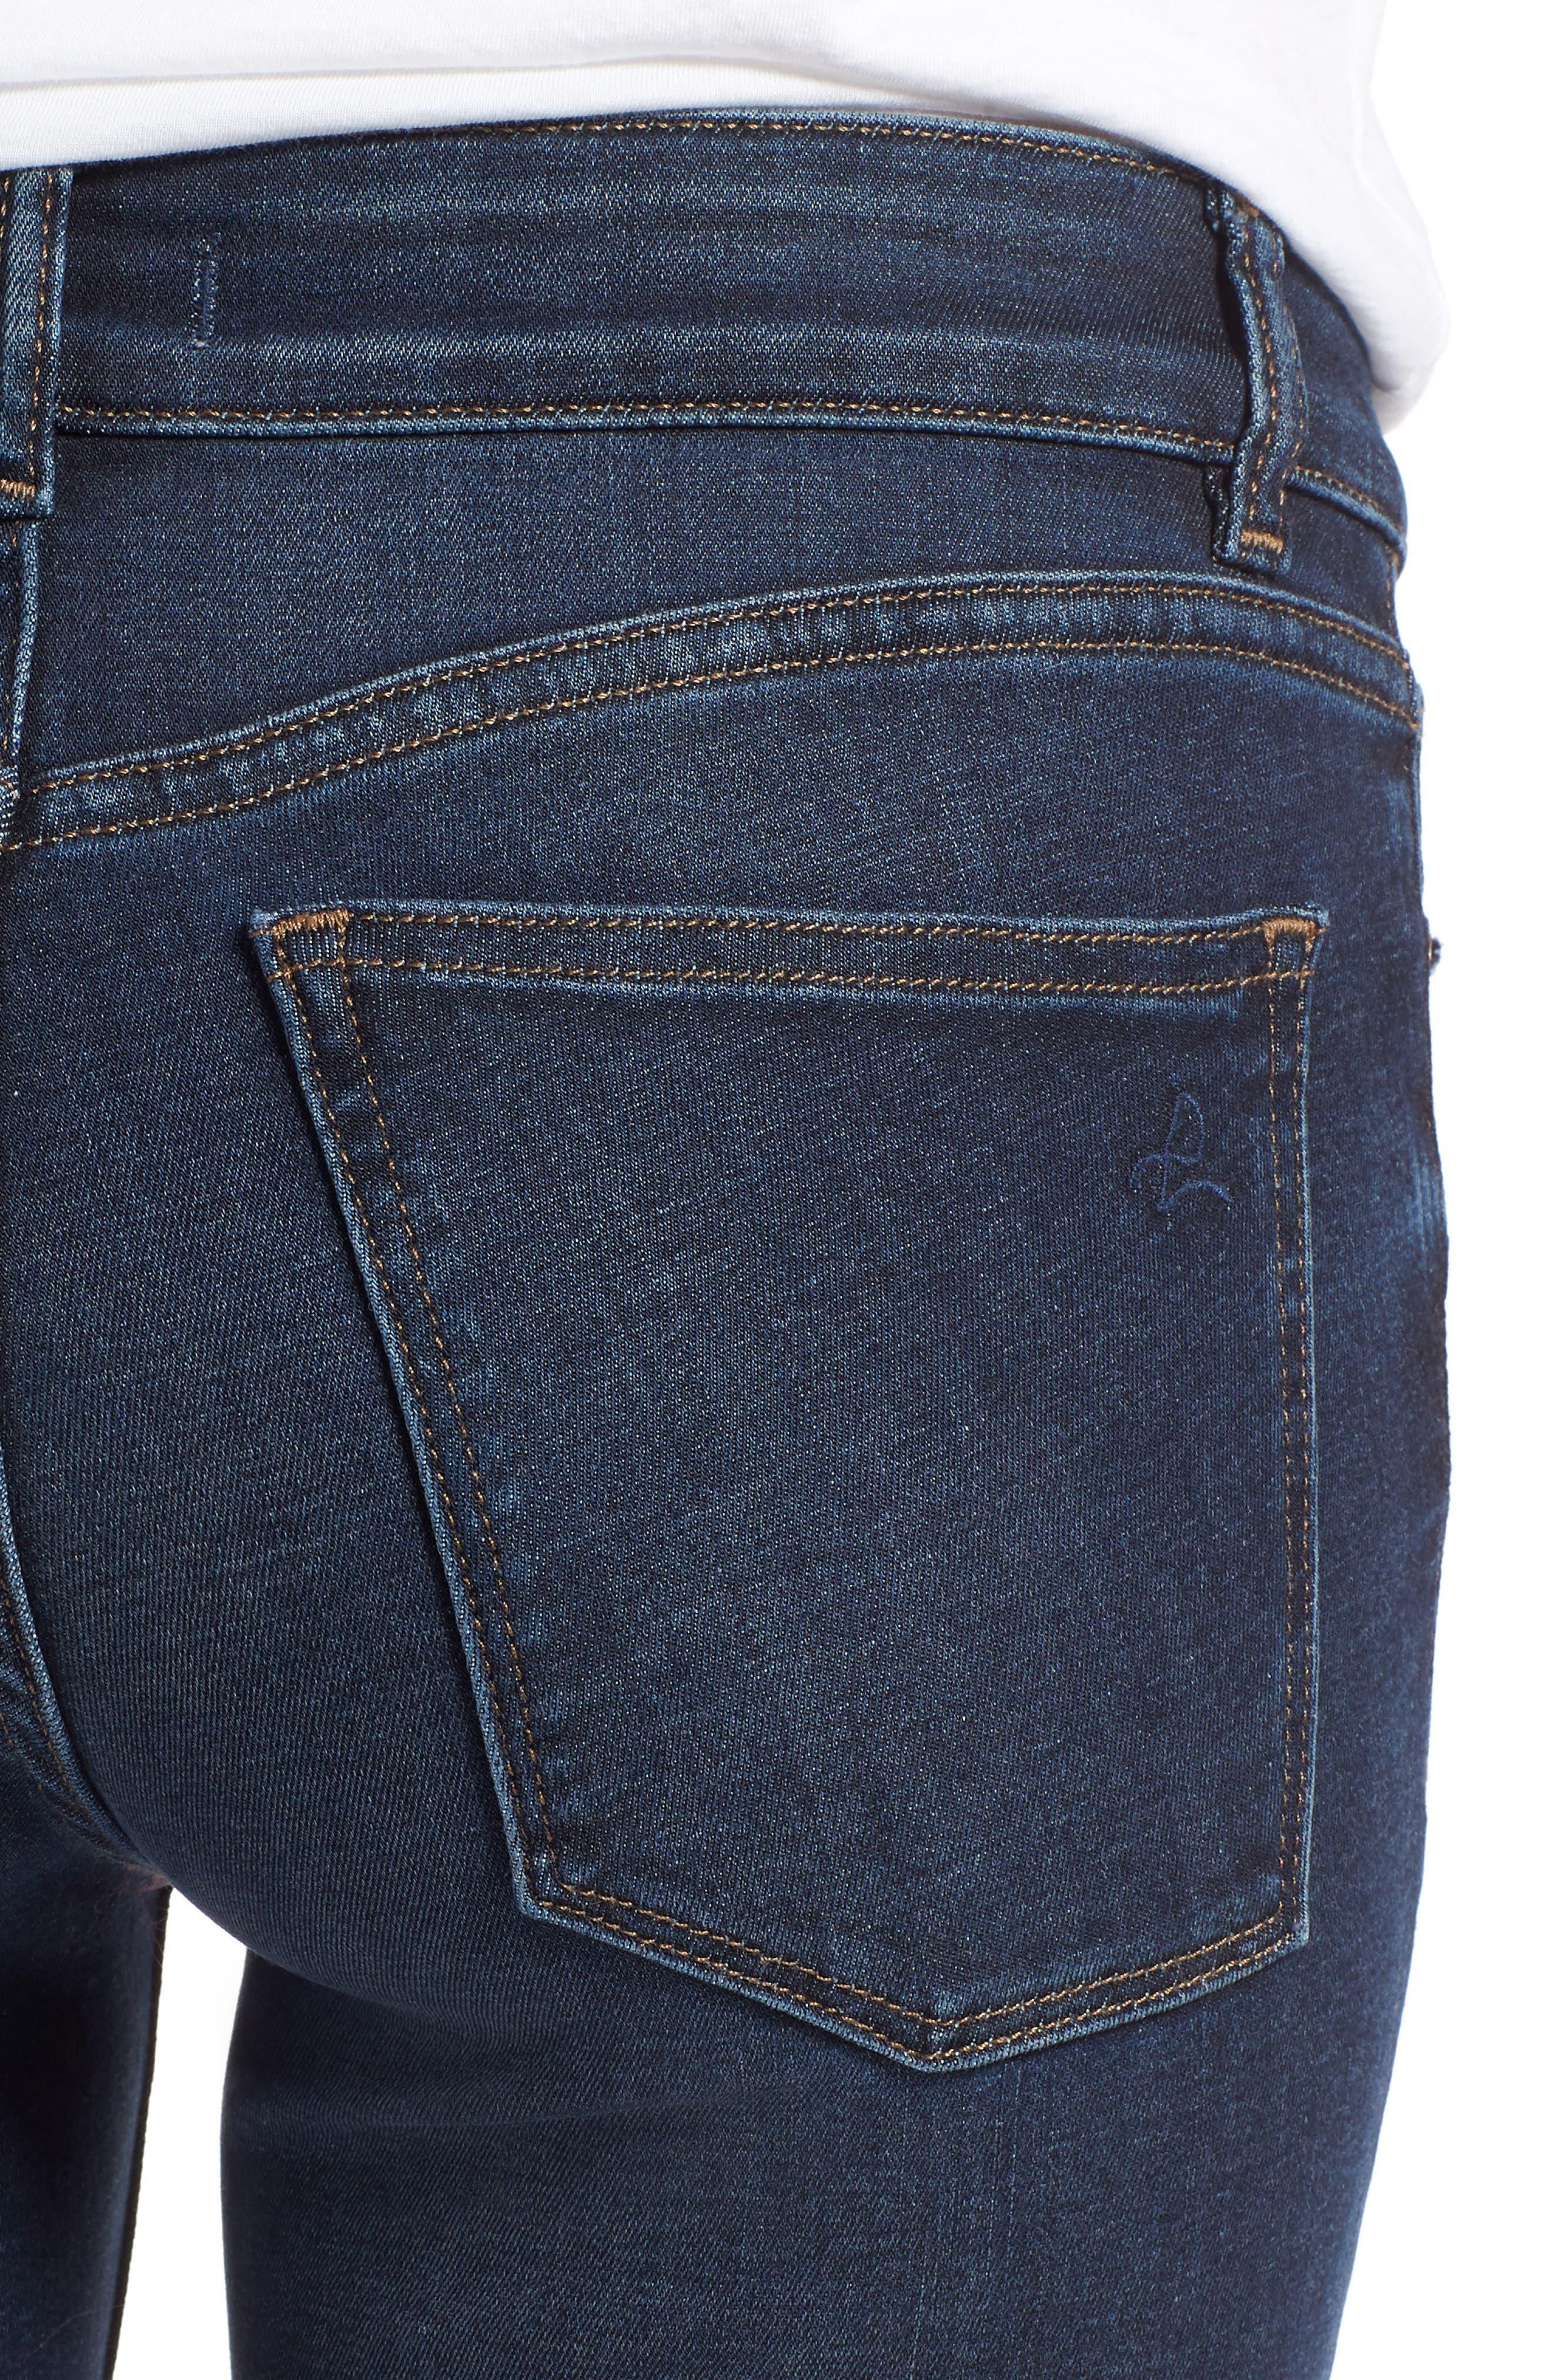 Florence Instasculpt Ankle Skinny Jeans,                             Alternate thumbnail 4, color,                             425